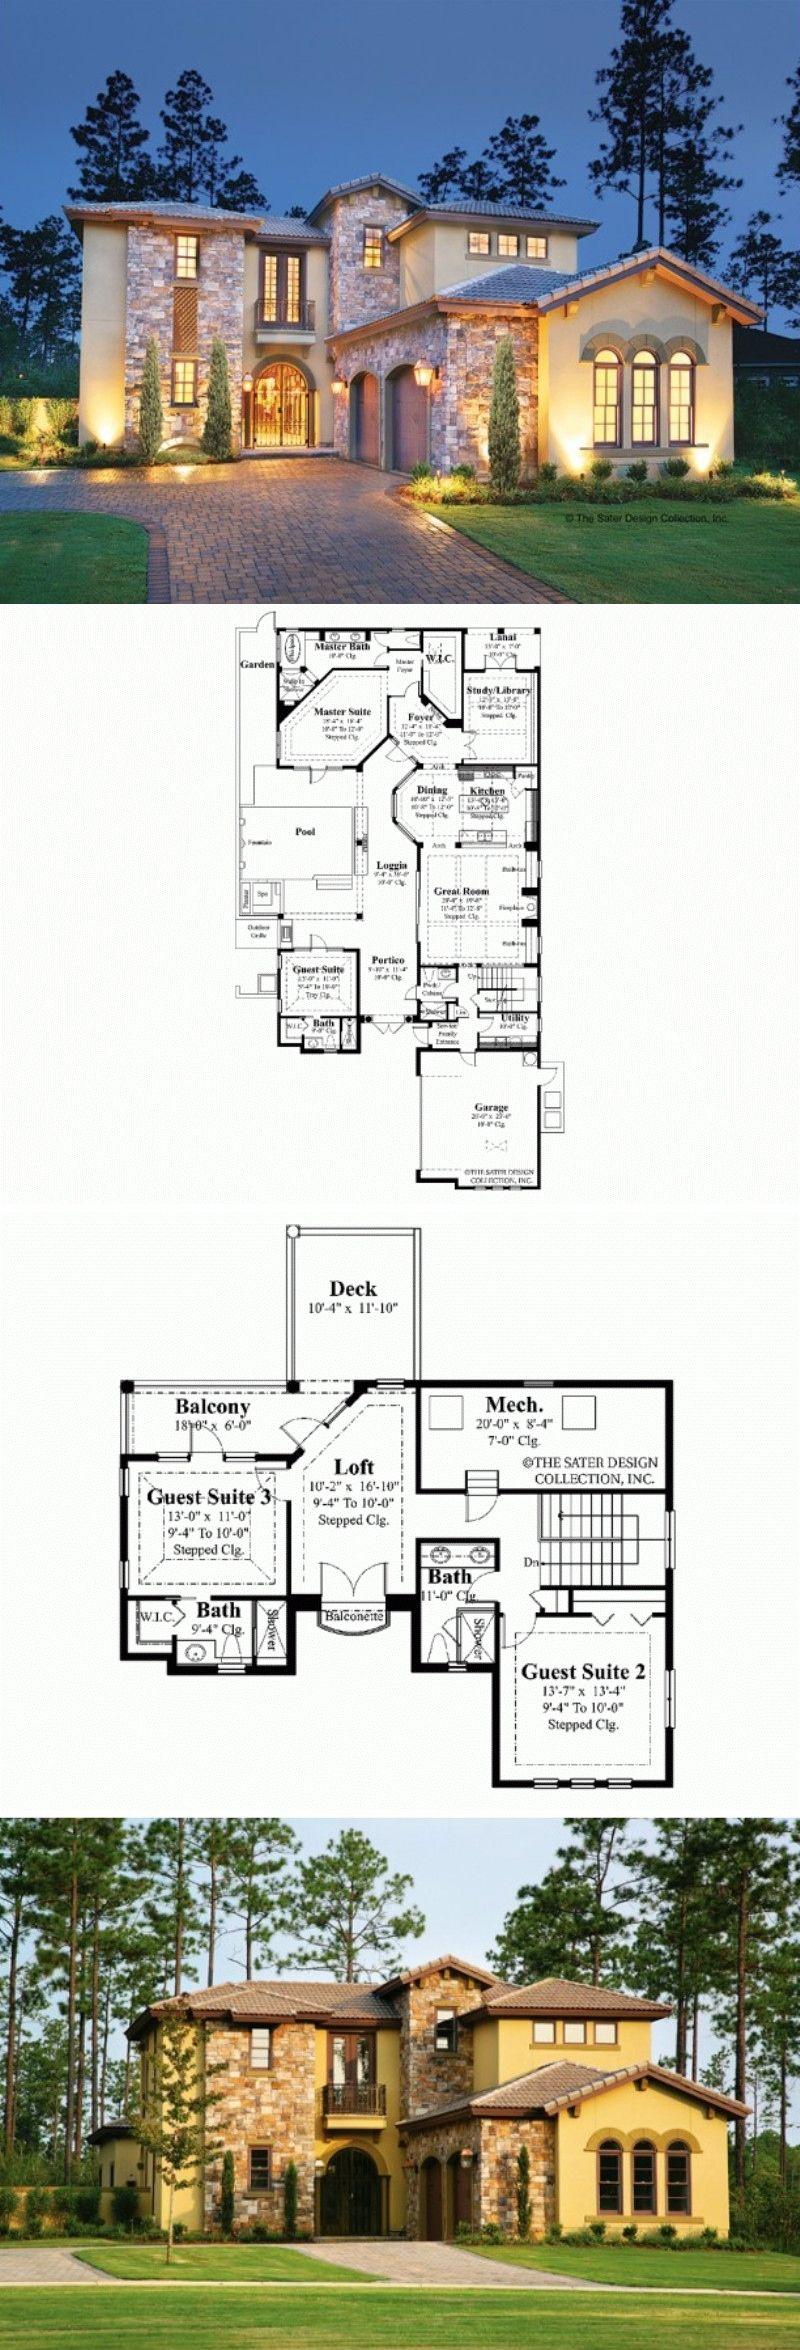 mediterranean house plan hwepl13160 gentleman s homes mediterranean house plan hwepl13160